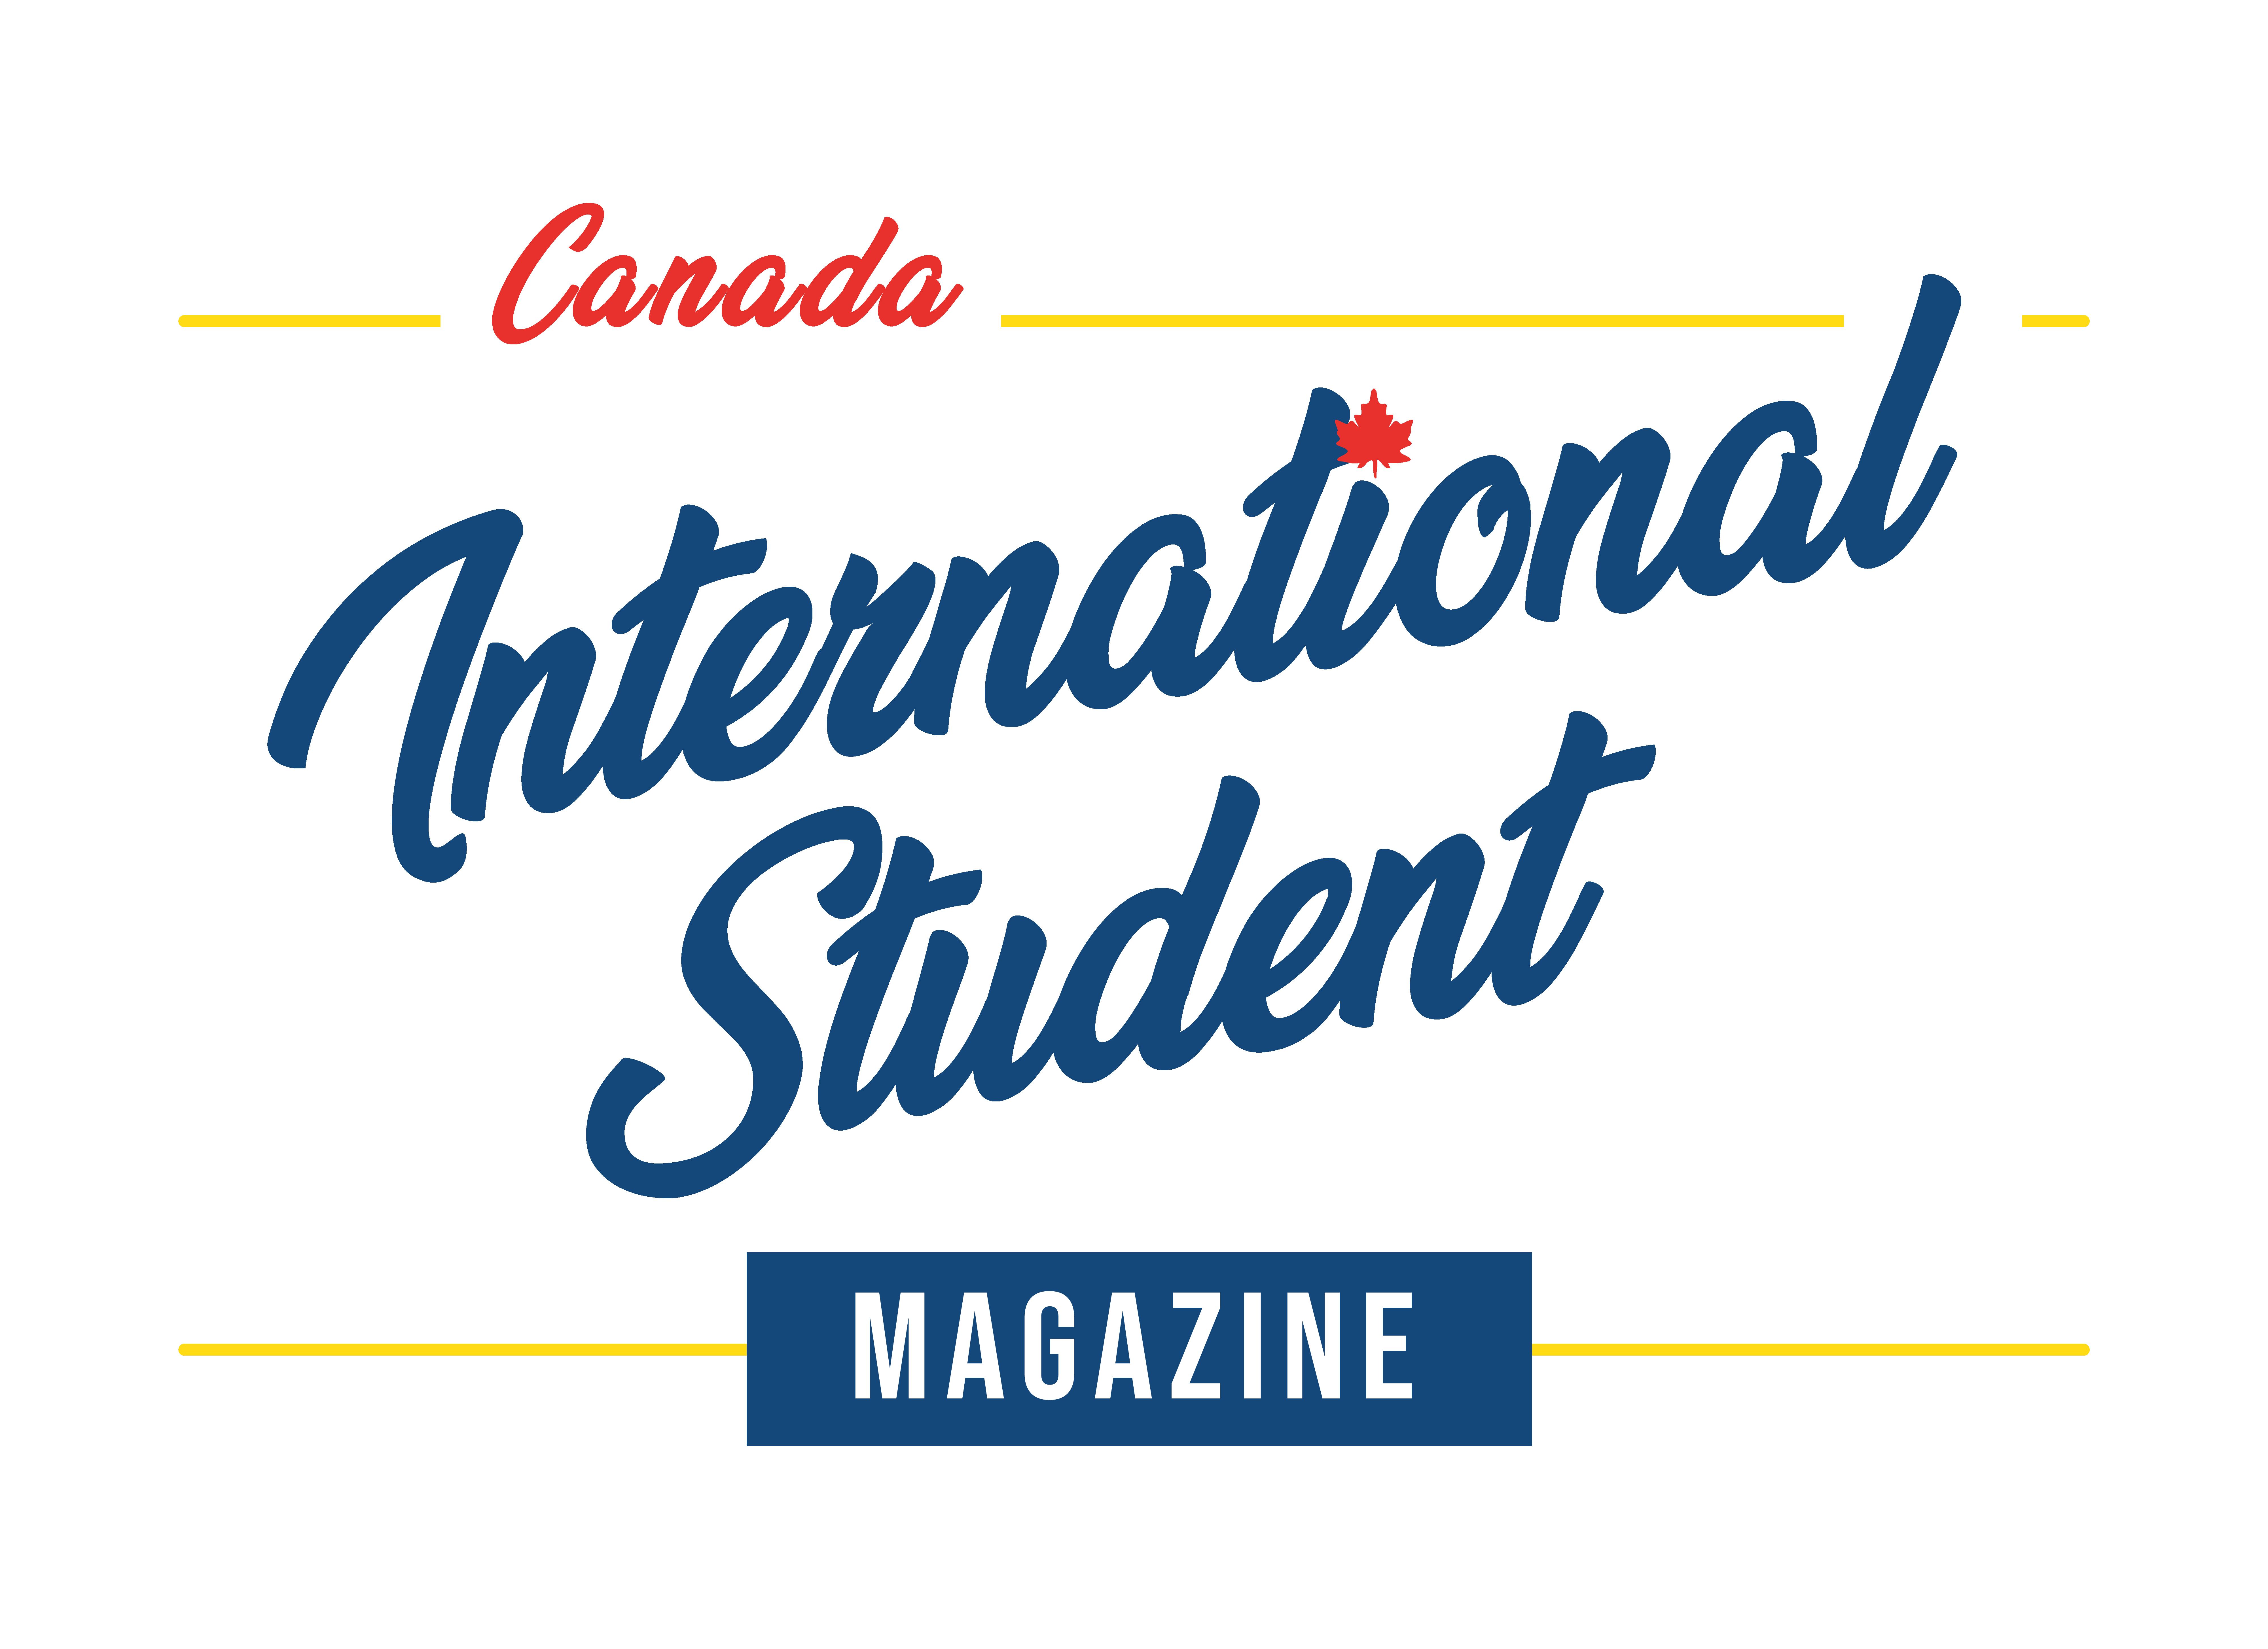 CISM – Canada International Student Magazine